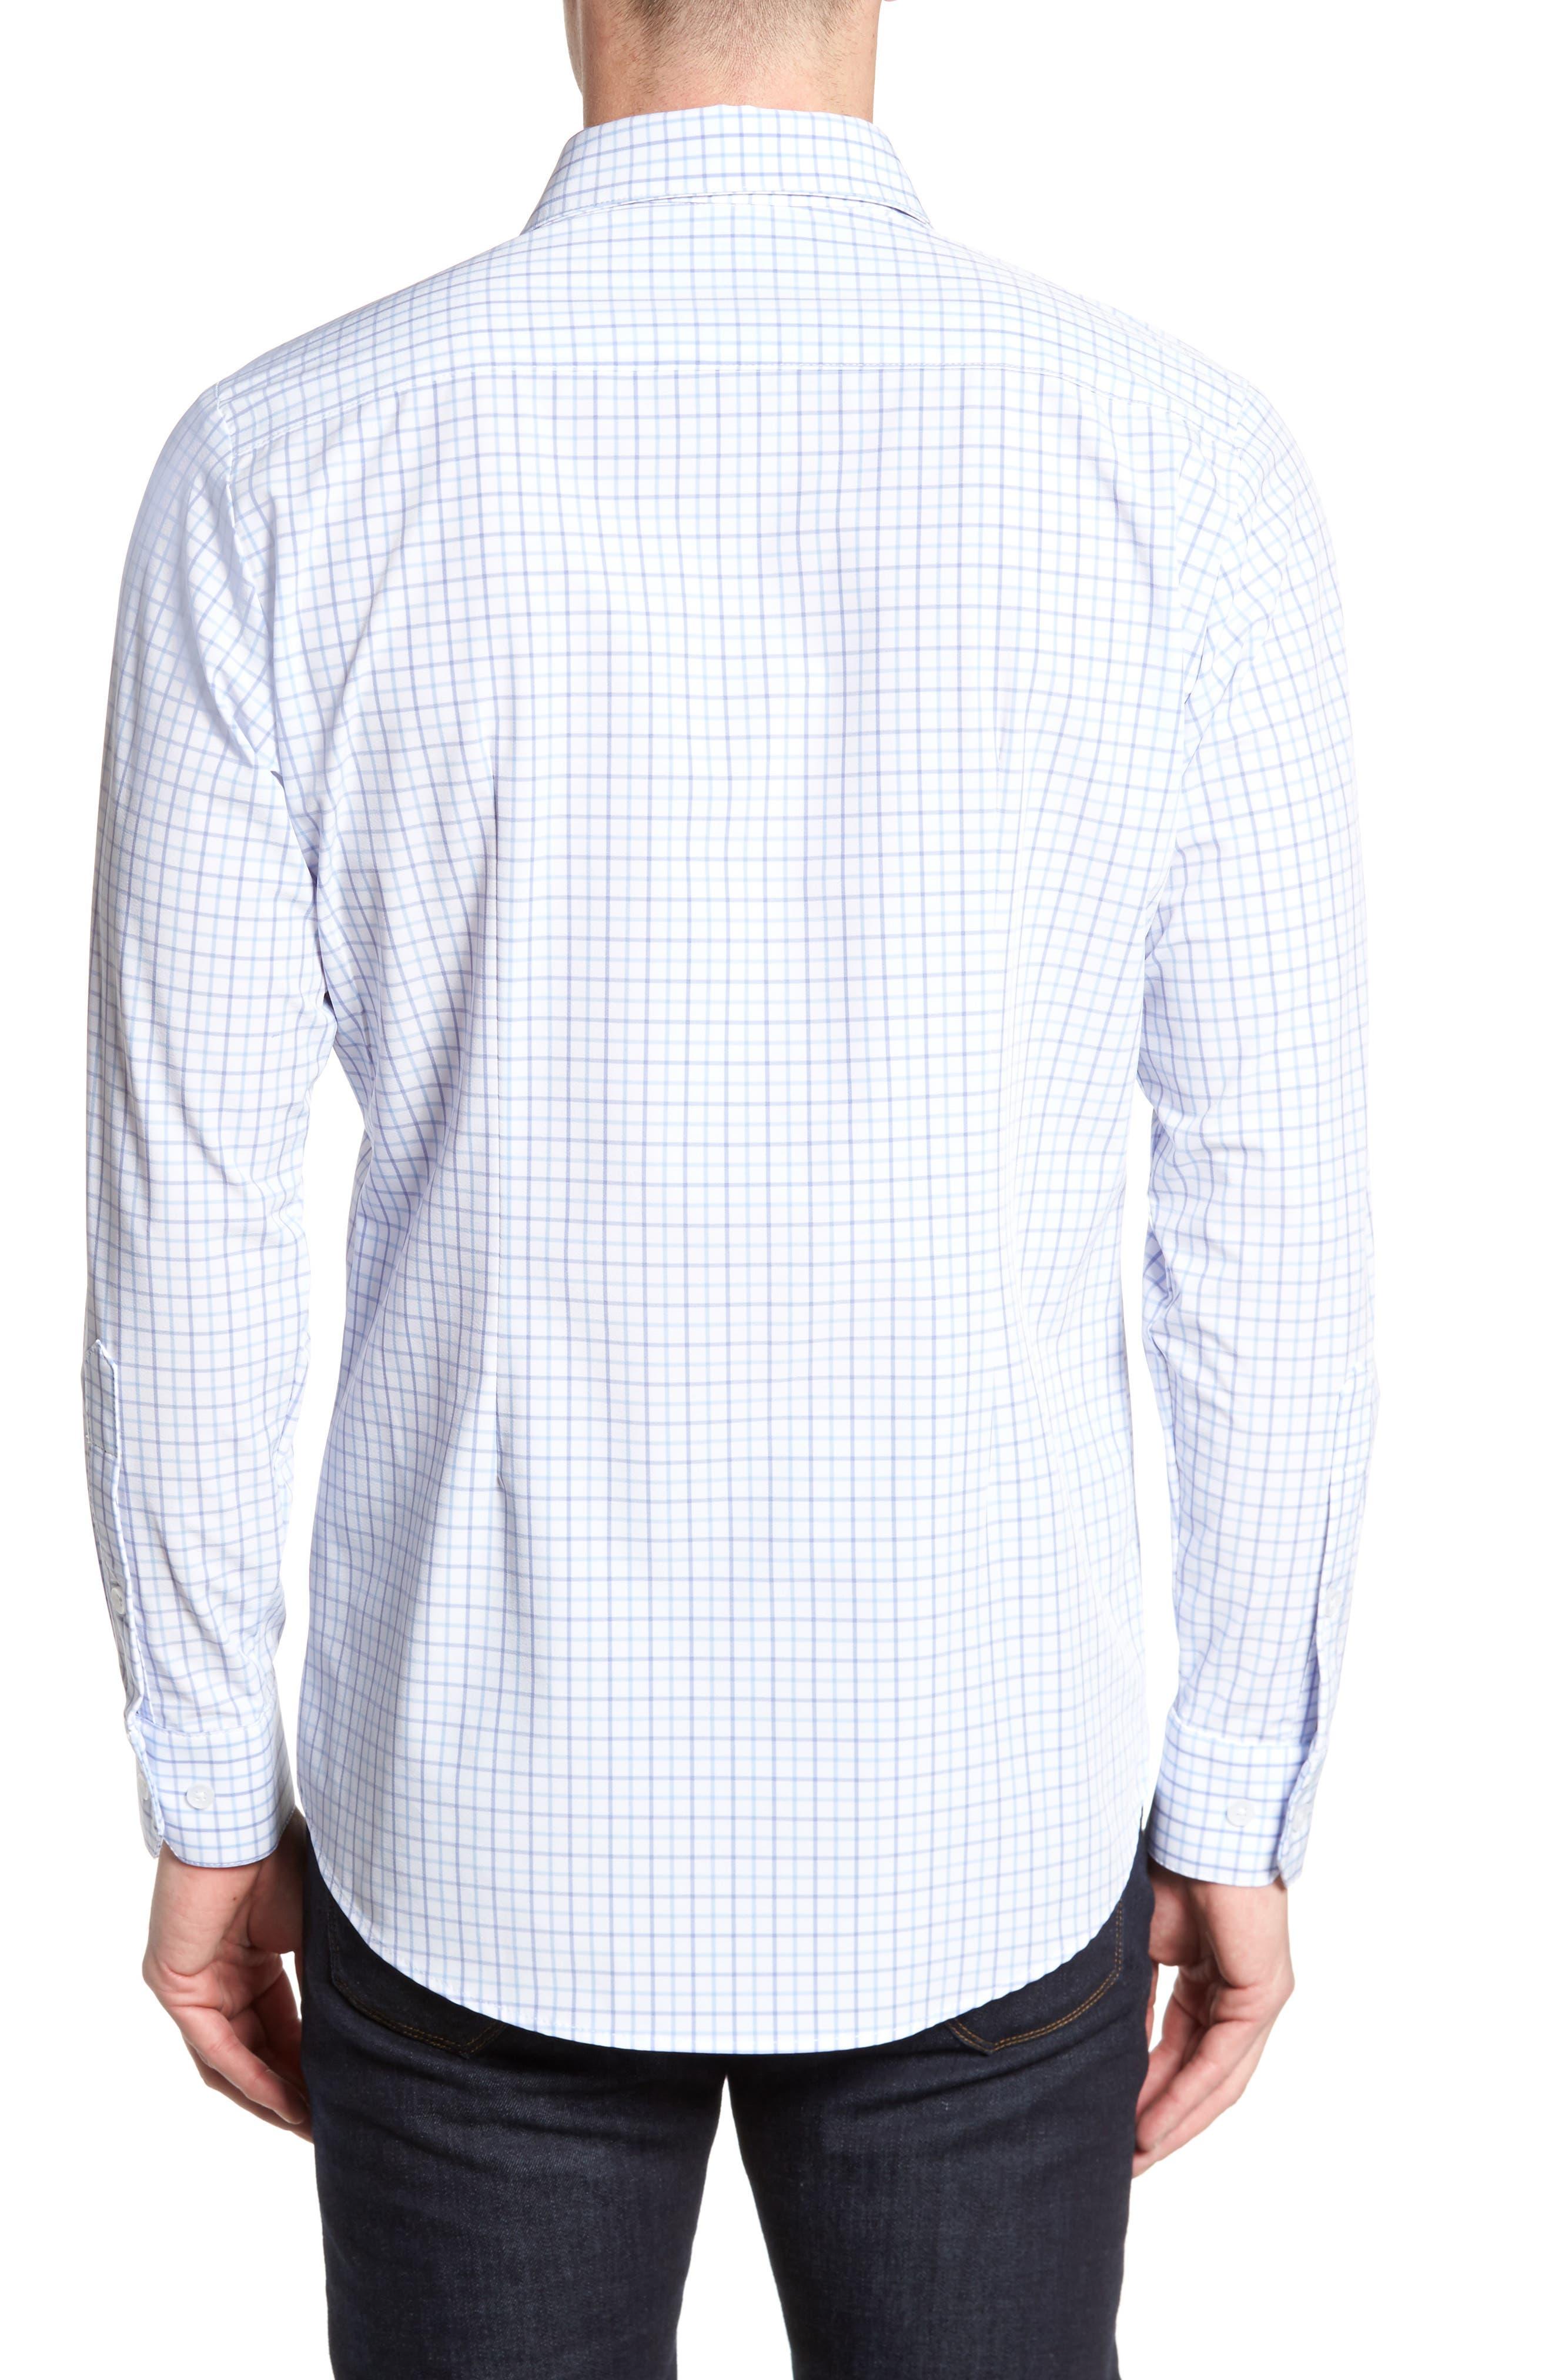 Hallandale Dusty Lavender Check Sport Shirt,                             Alternate thumbnail 3, color,                             White